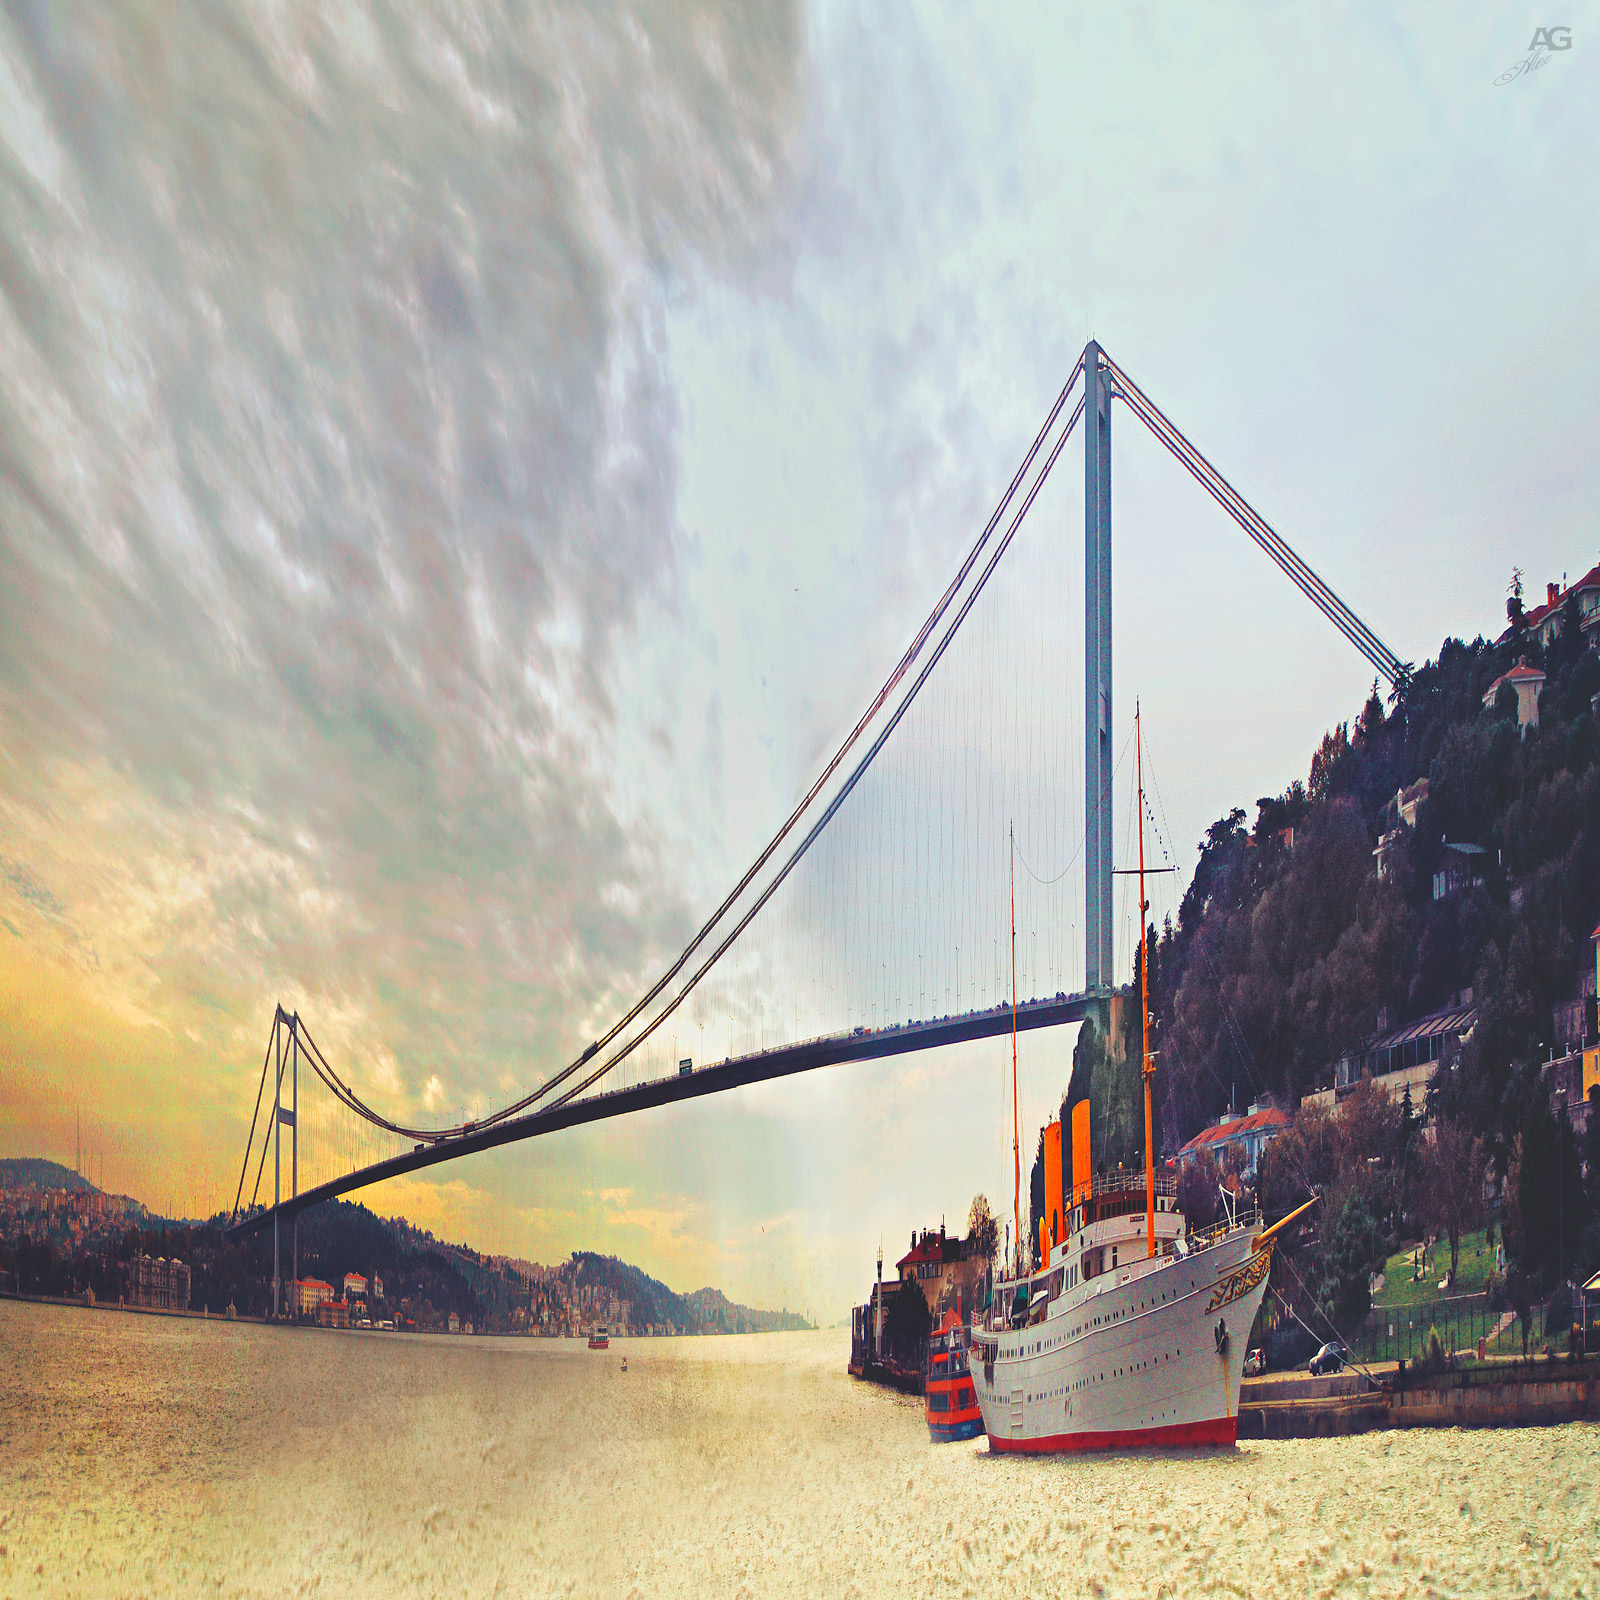 Istanbul_GoldenGateAtaturksYacht_variablySquished_1600